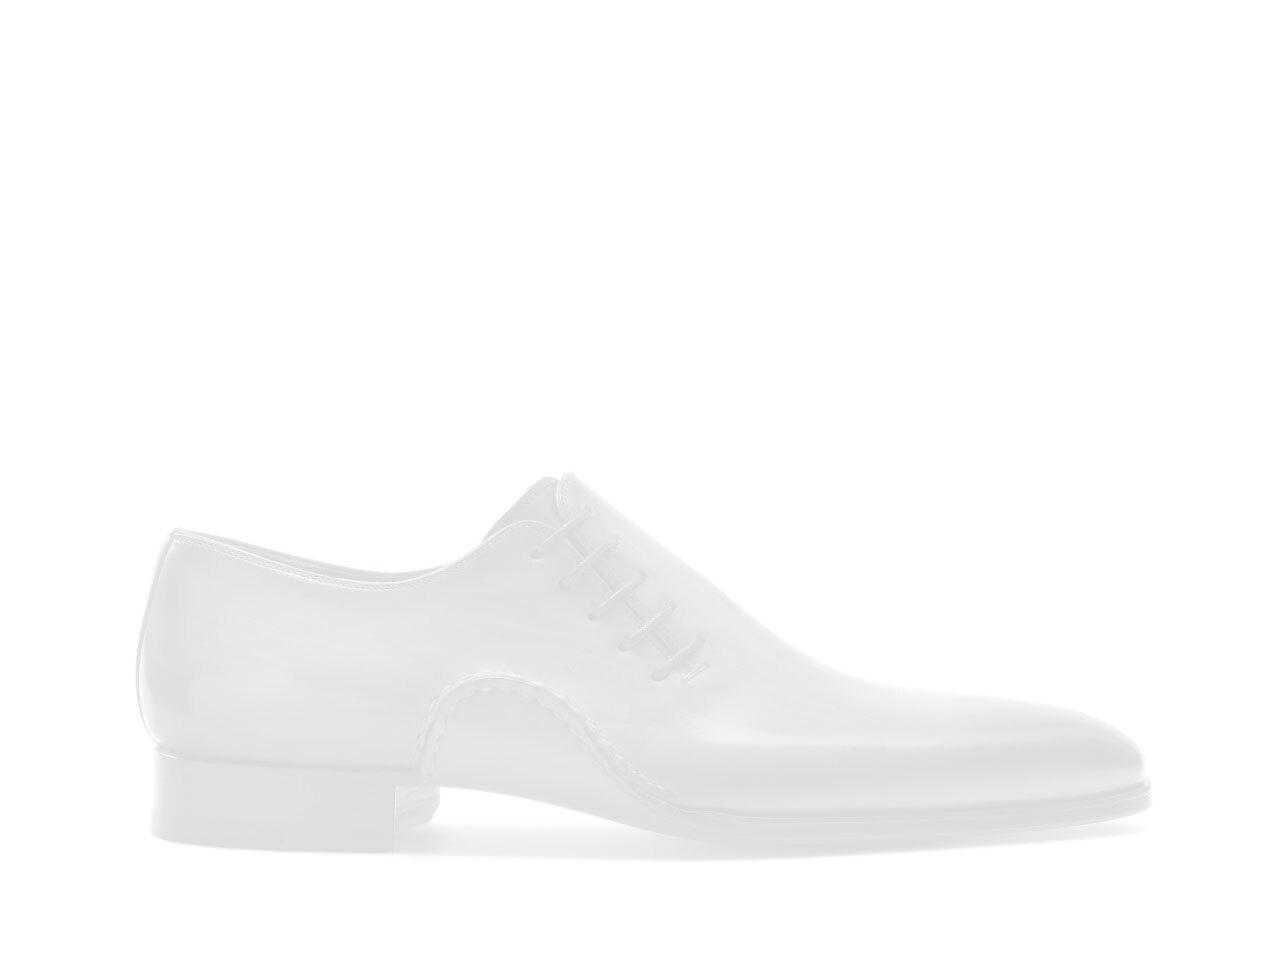 Pair of the Magnanni Dorio Black Men's Velvet Loafers